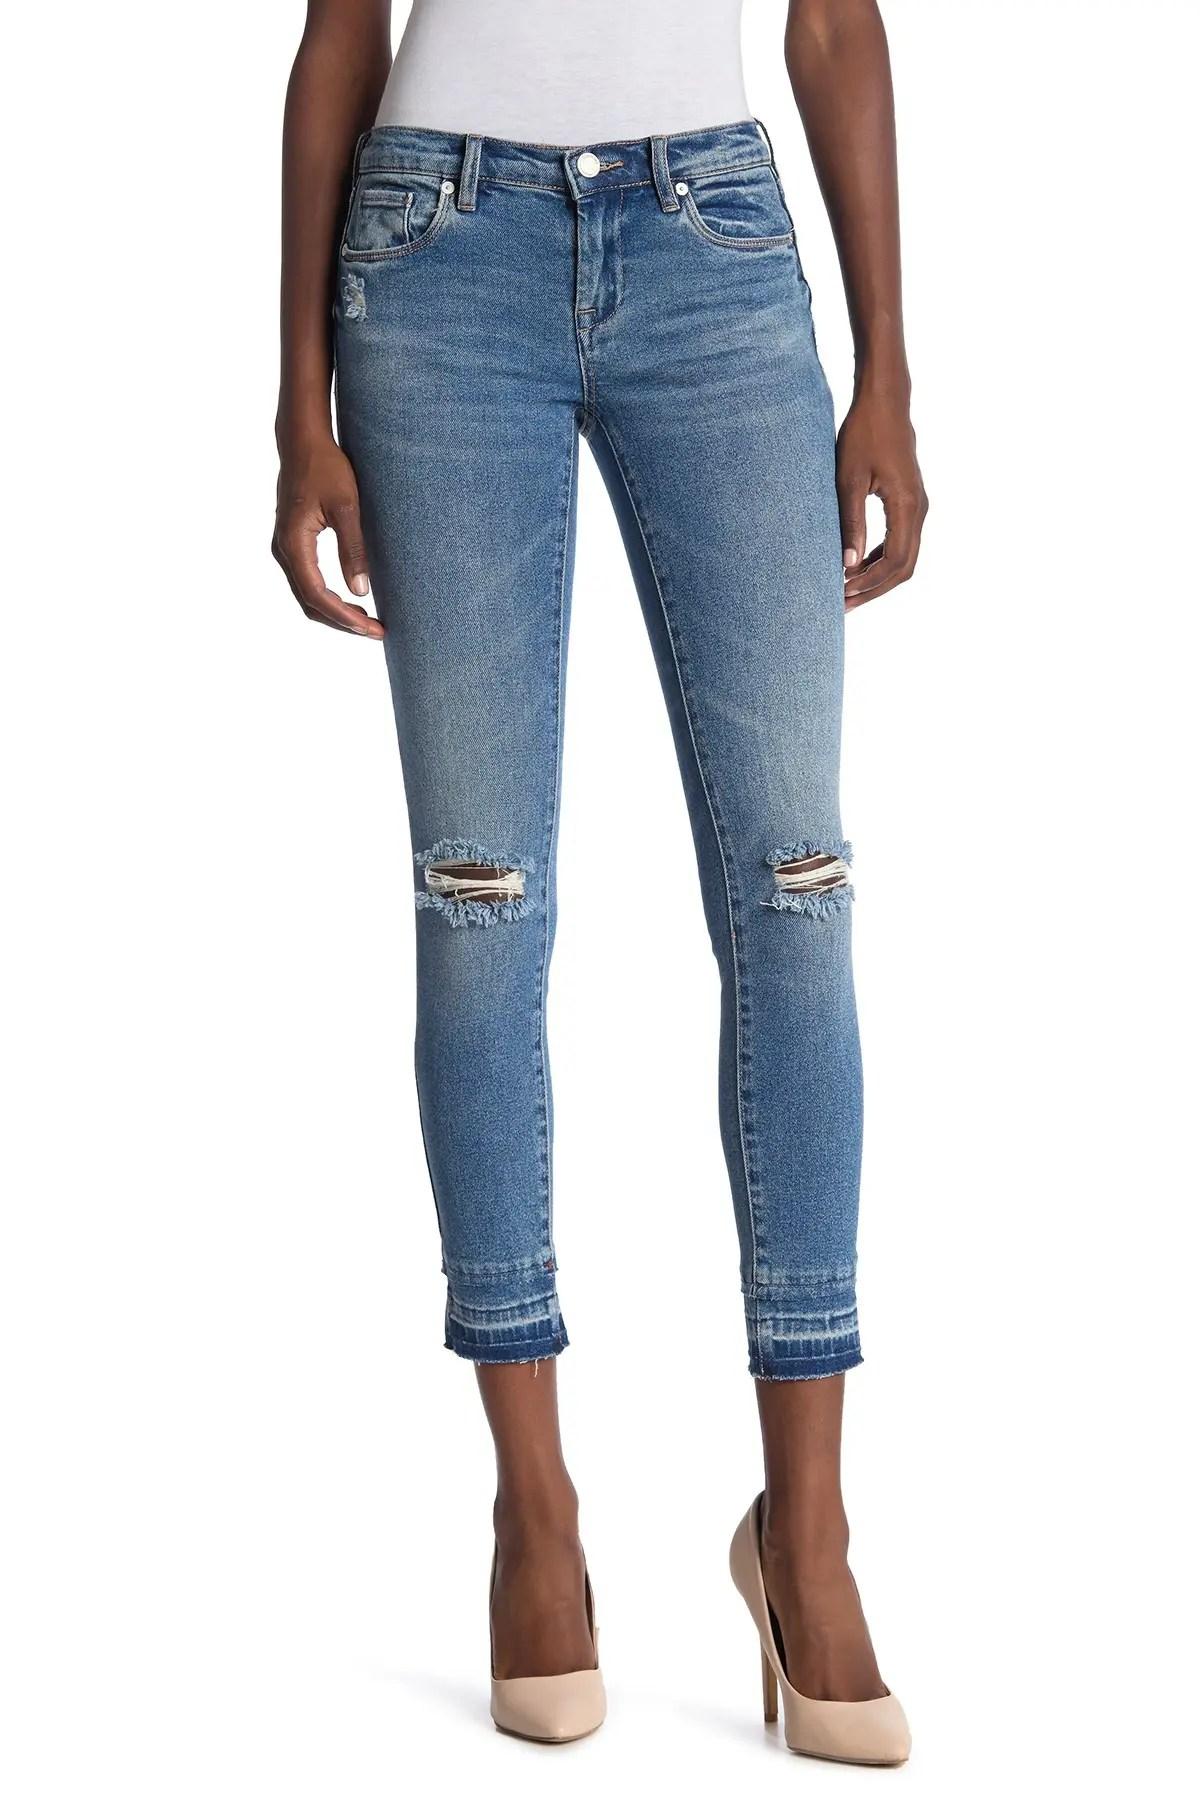 blanknyc denim the reade released hem ripped skinny jeans nordstrom rack